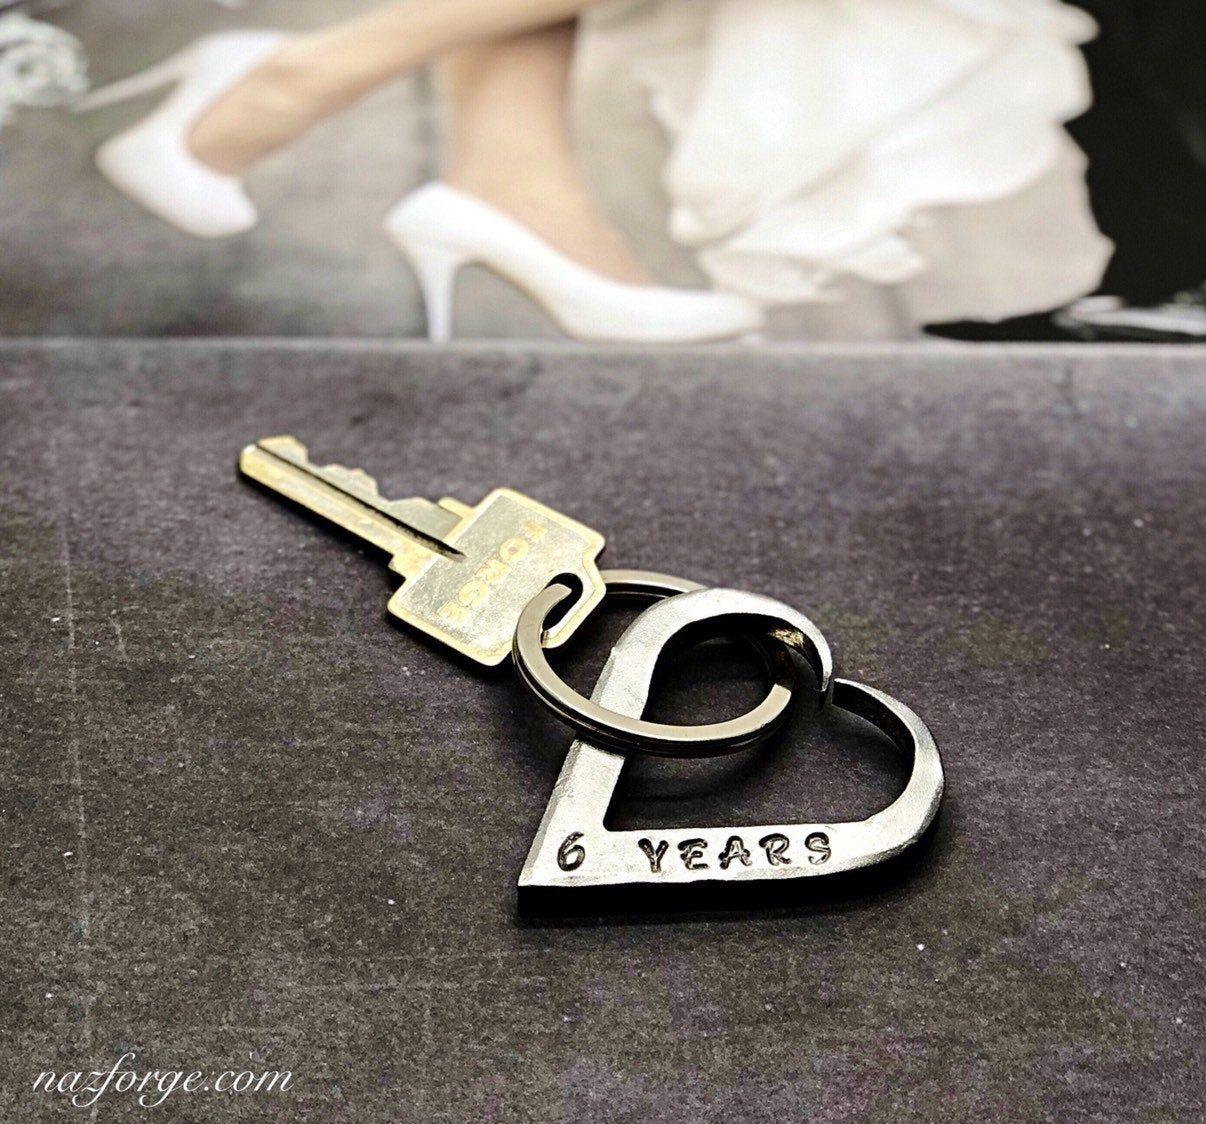 6th wedding anniversary iron keychain gift idea for wife